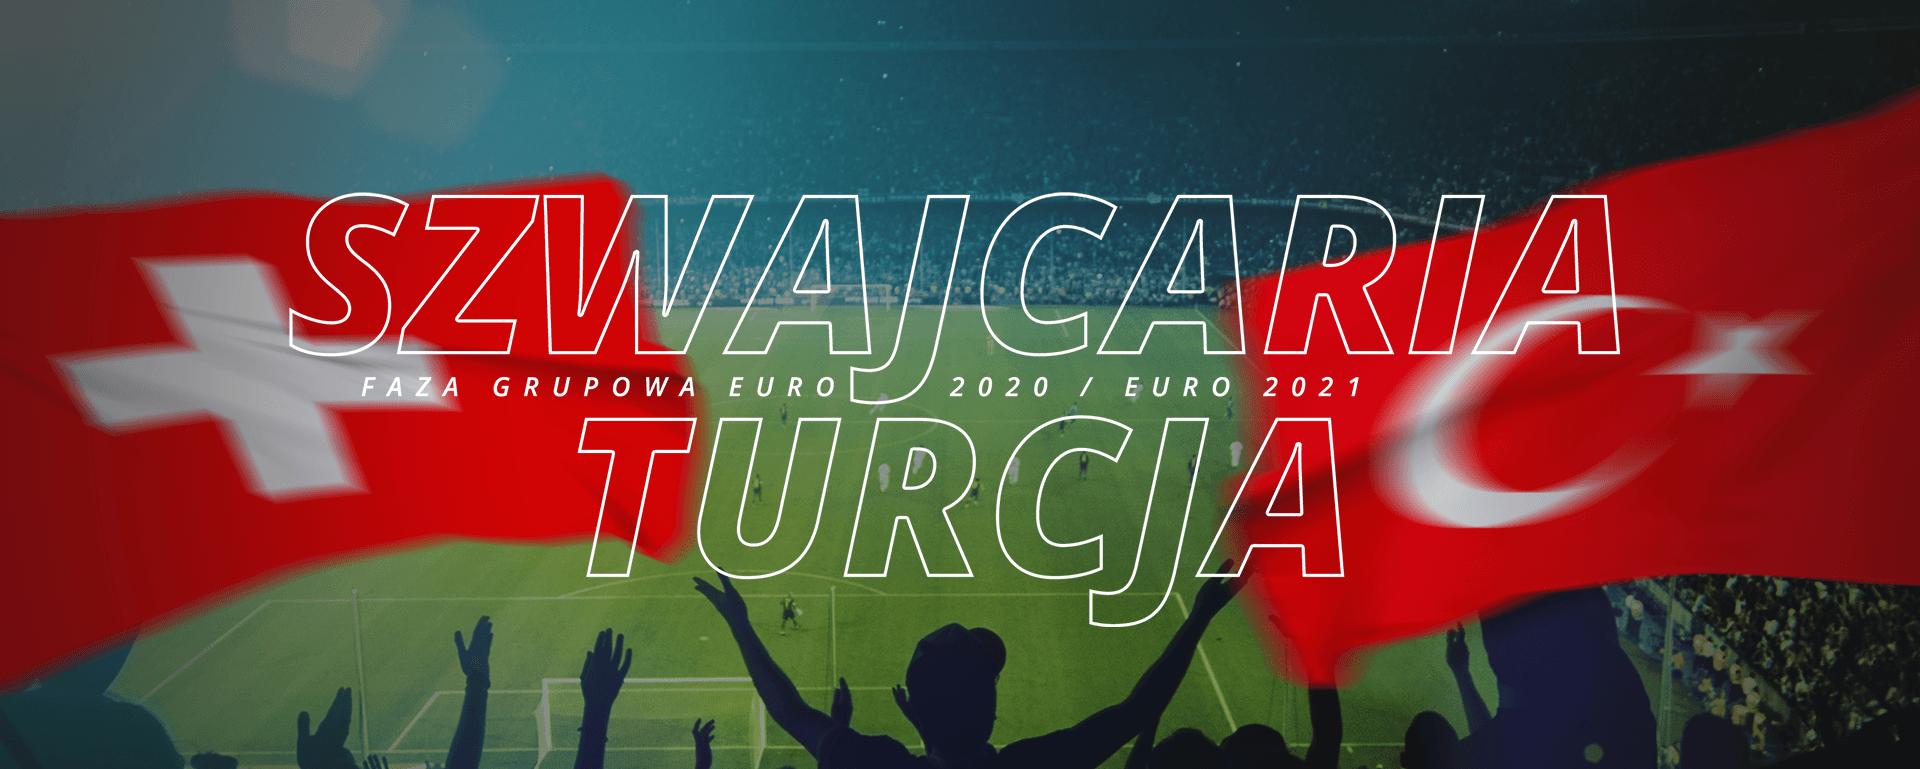 Szwajcaria – Turcja | faza grupowa Euro 2020 / Euro 2021